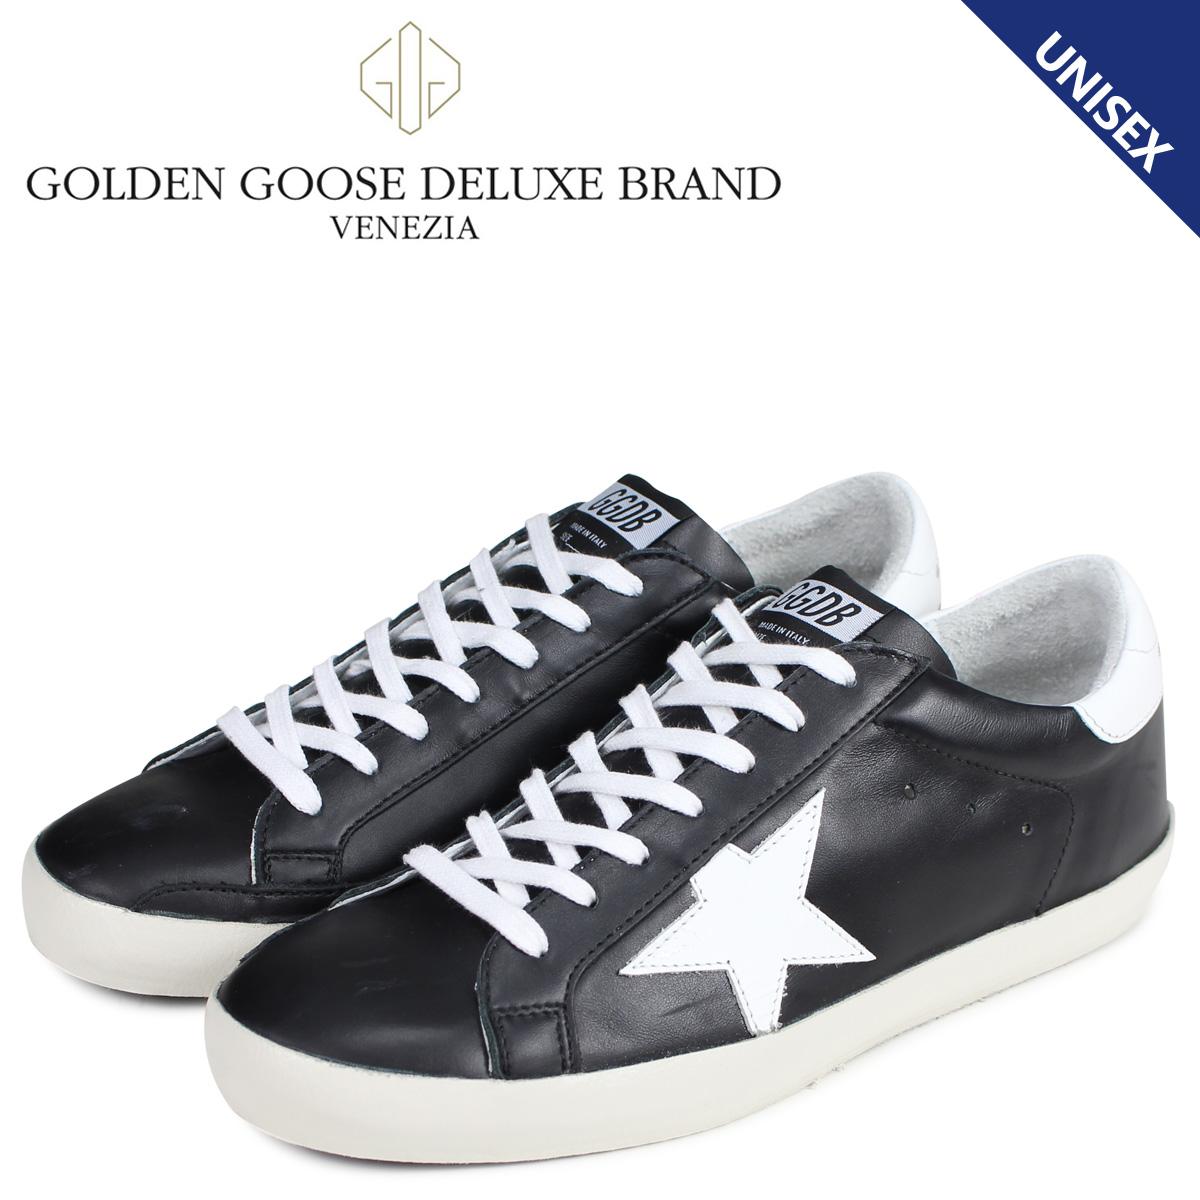 Golden Goose ゴールデングース SUPERSTAR スニーカー スーパースター メンズ レディース ブラック 黒 G34MS590 N31 [予約商品 4/18頃入荷予定 新入荷]